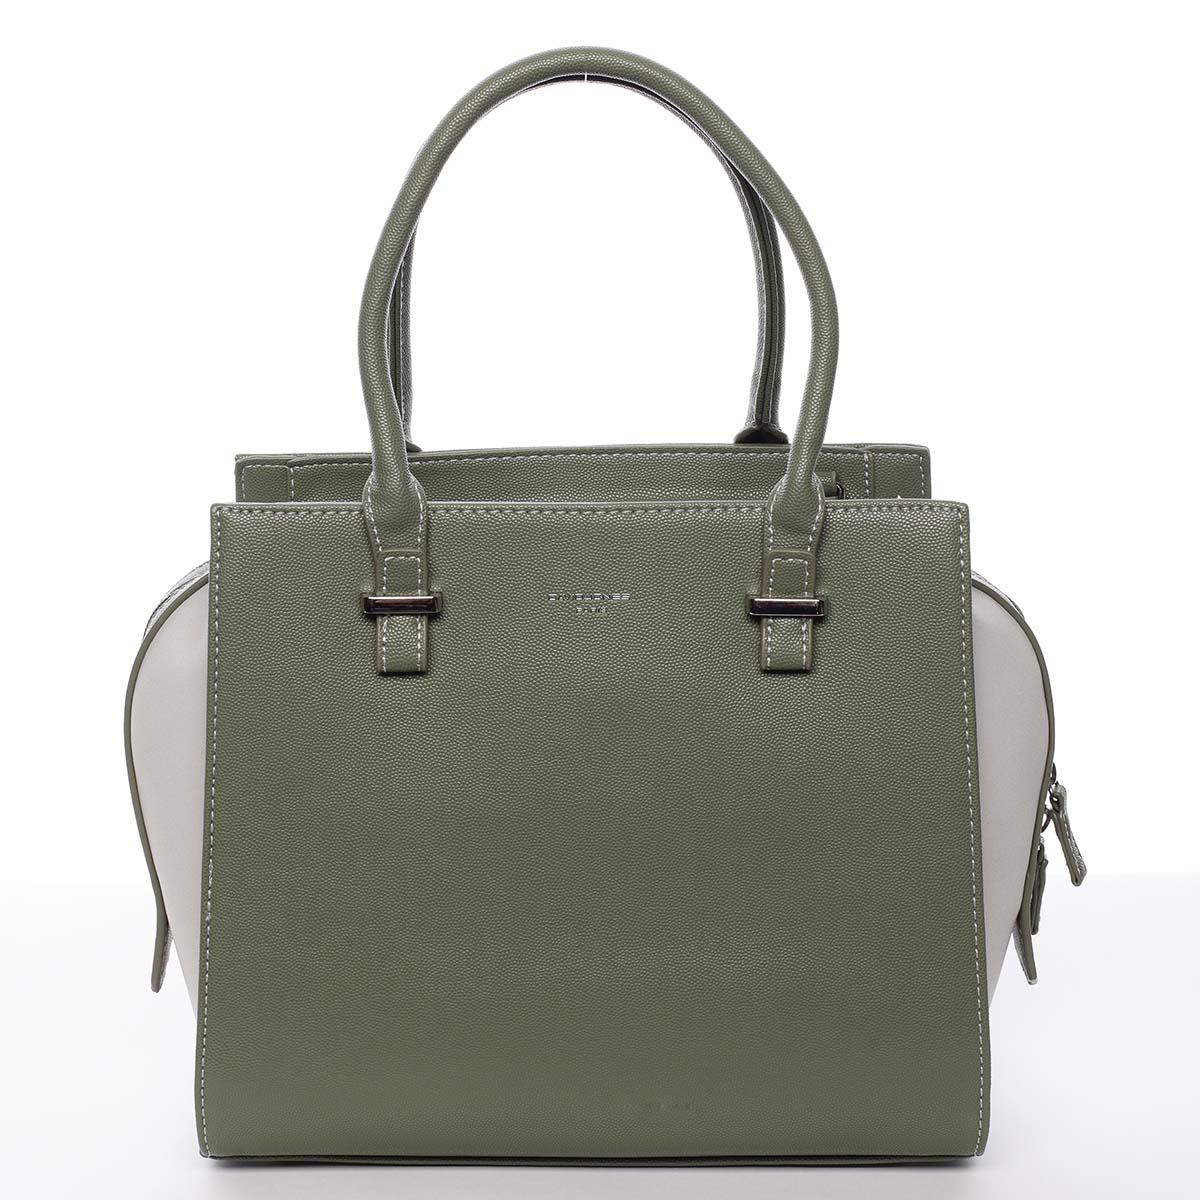 Luxusná módna olivovo zelená kabelka cez rameno - David Jones Ariana